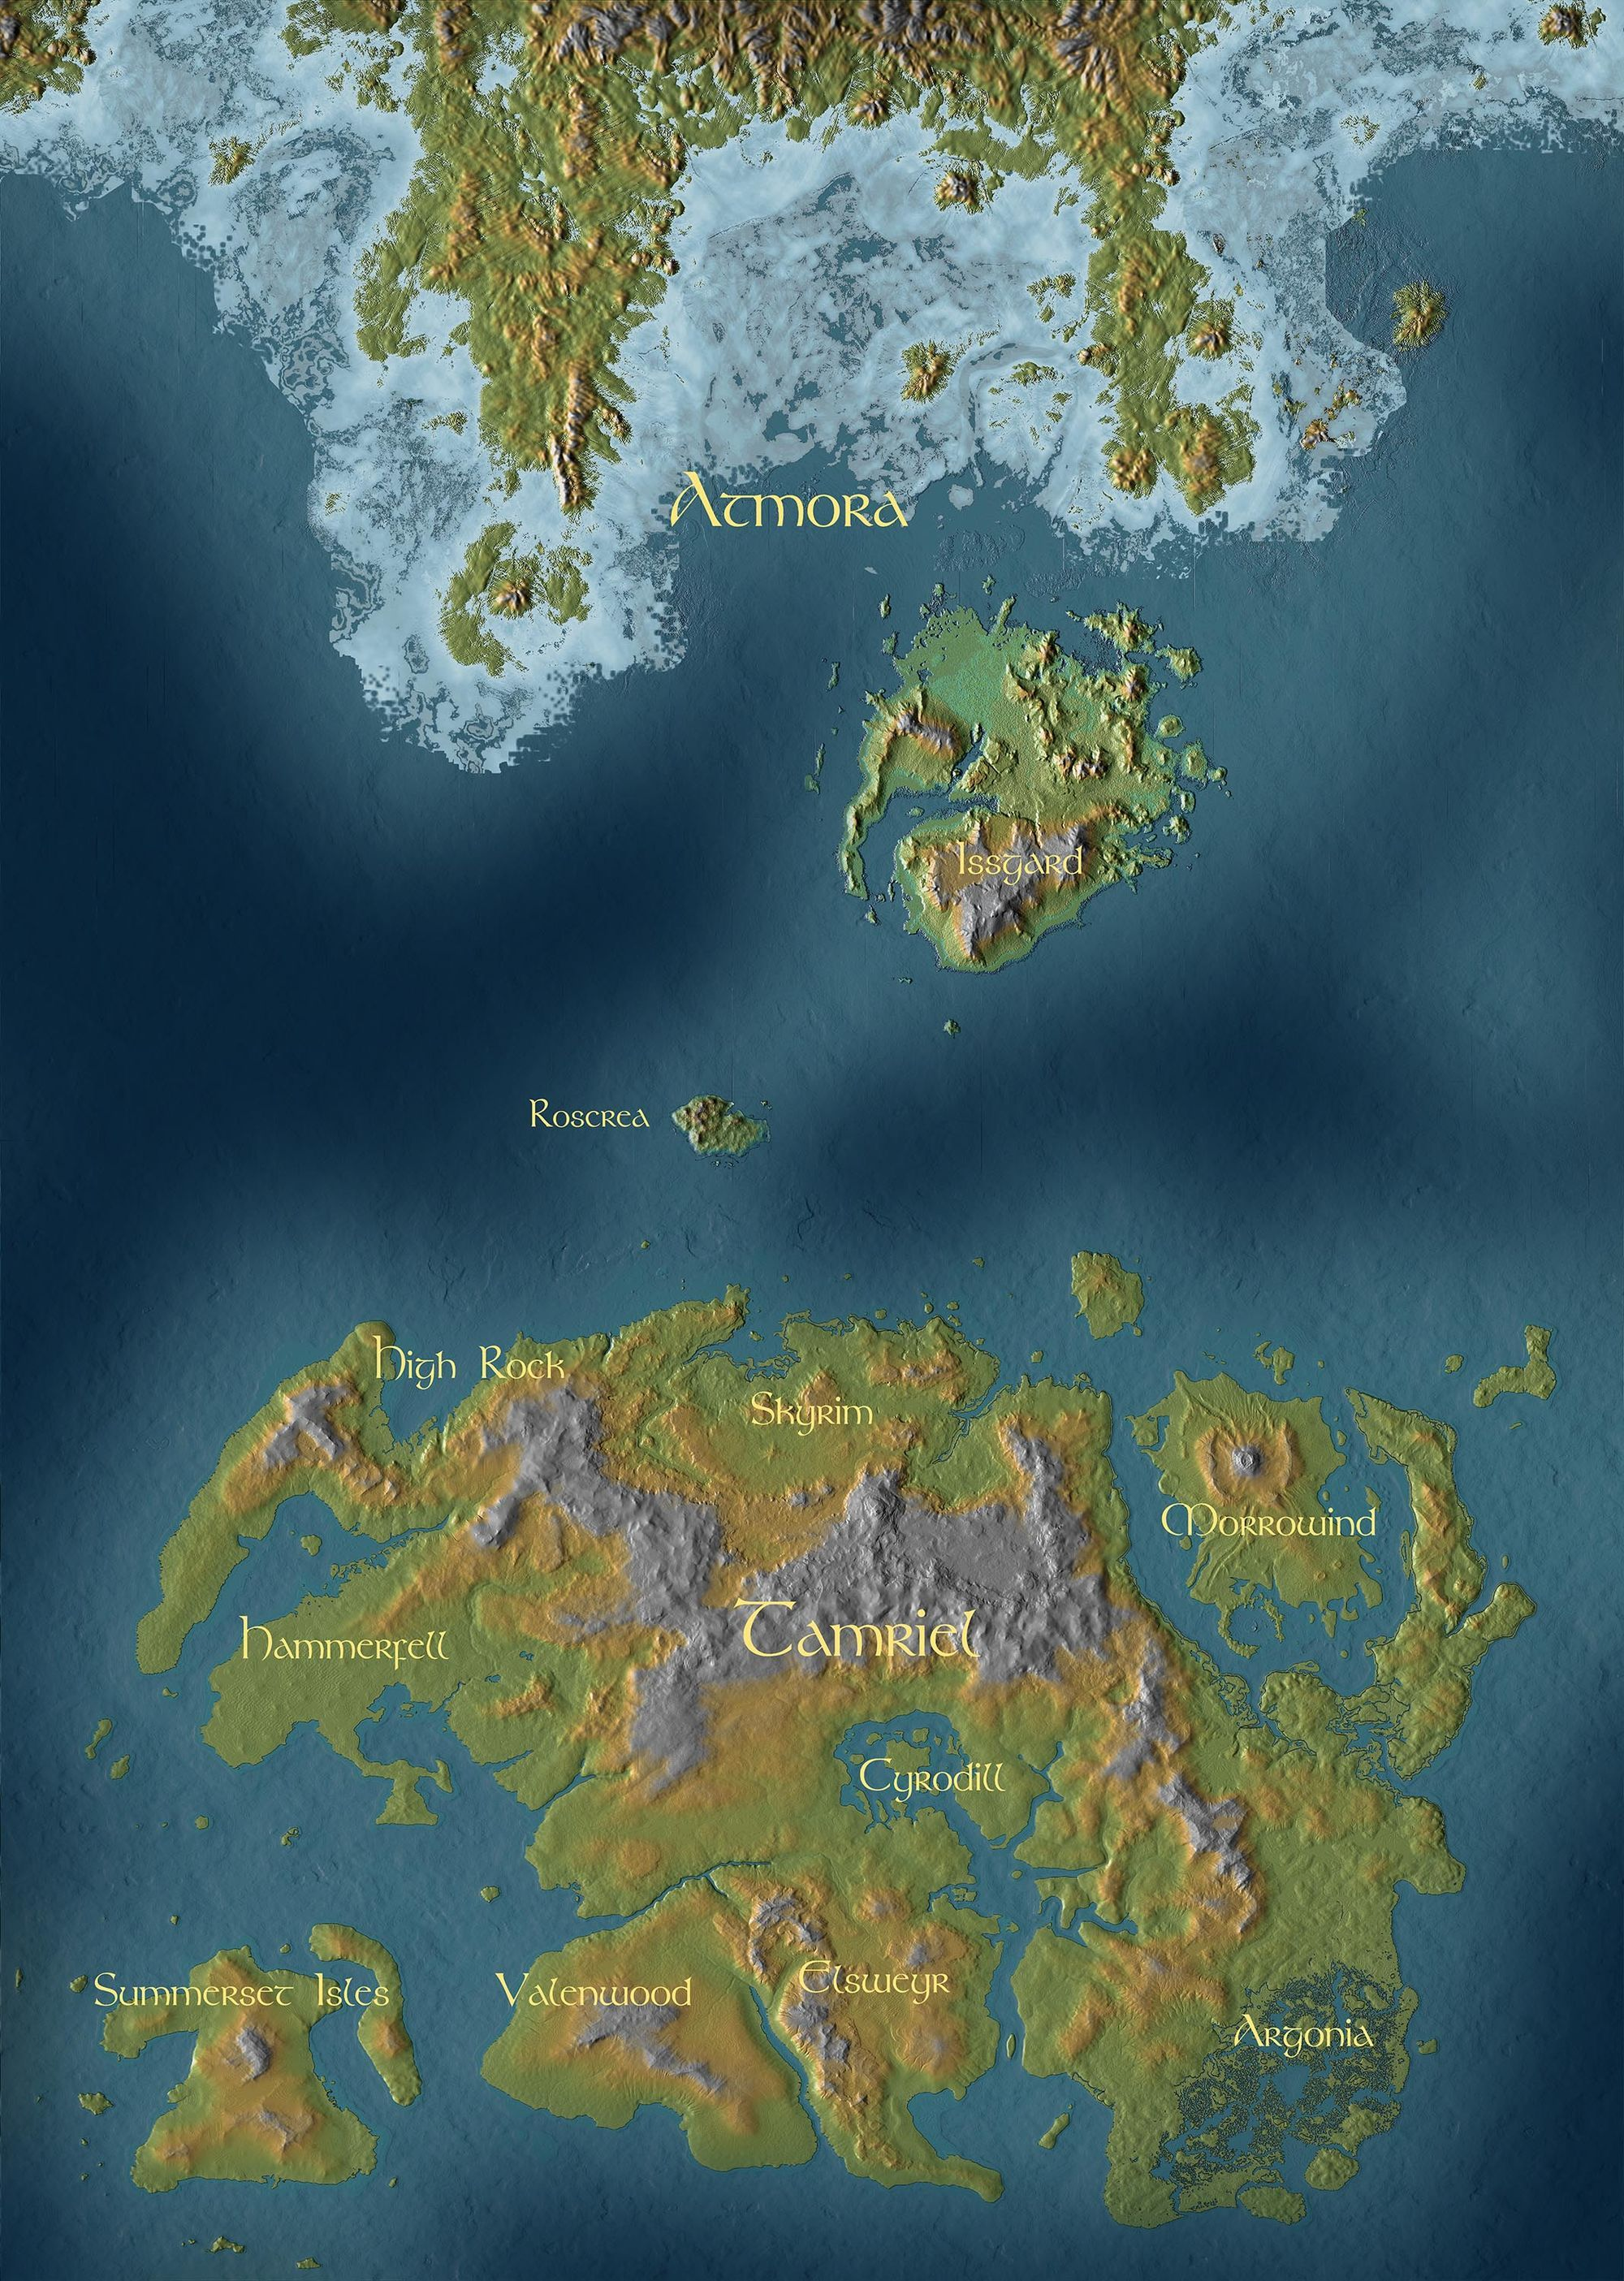 Elder Scrolls 2 Map Size : elder, scrolls, Ideas, Fantasy, World, Cartography